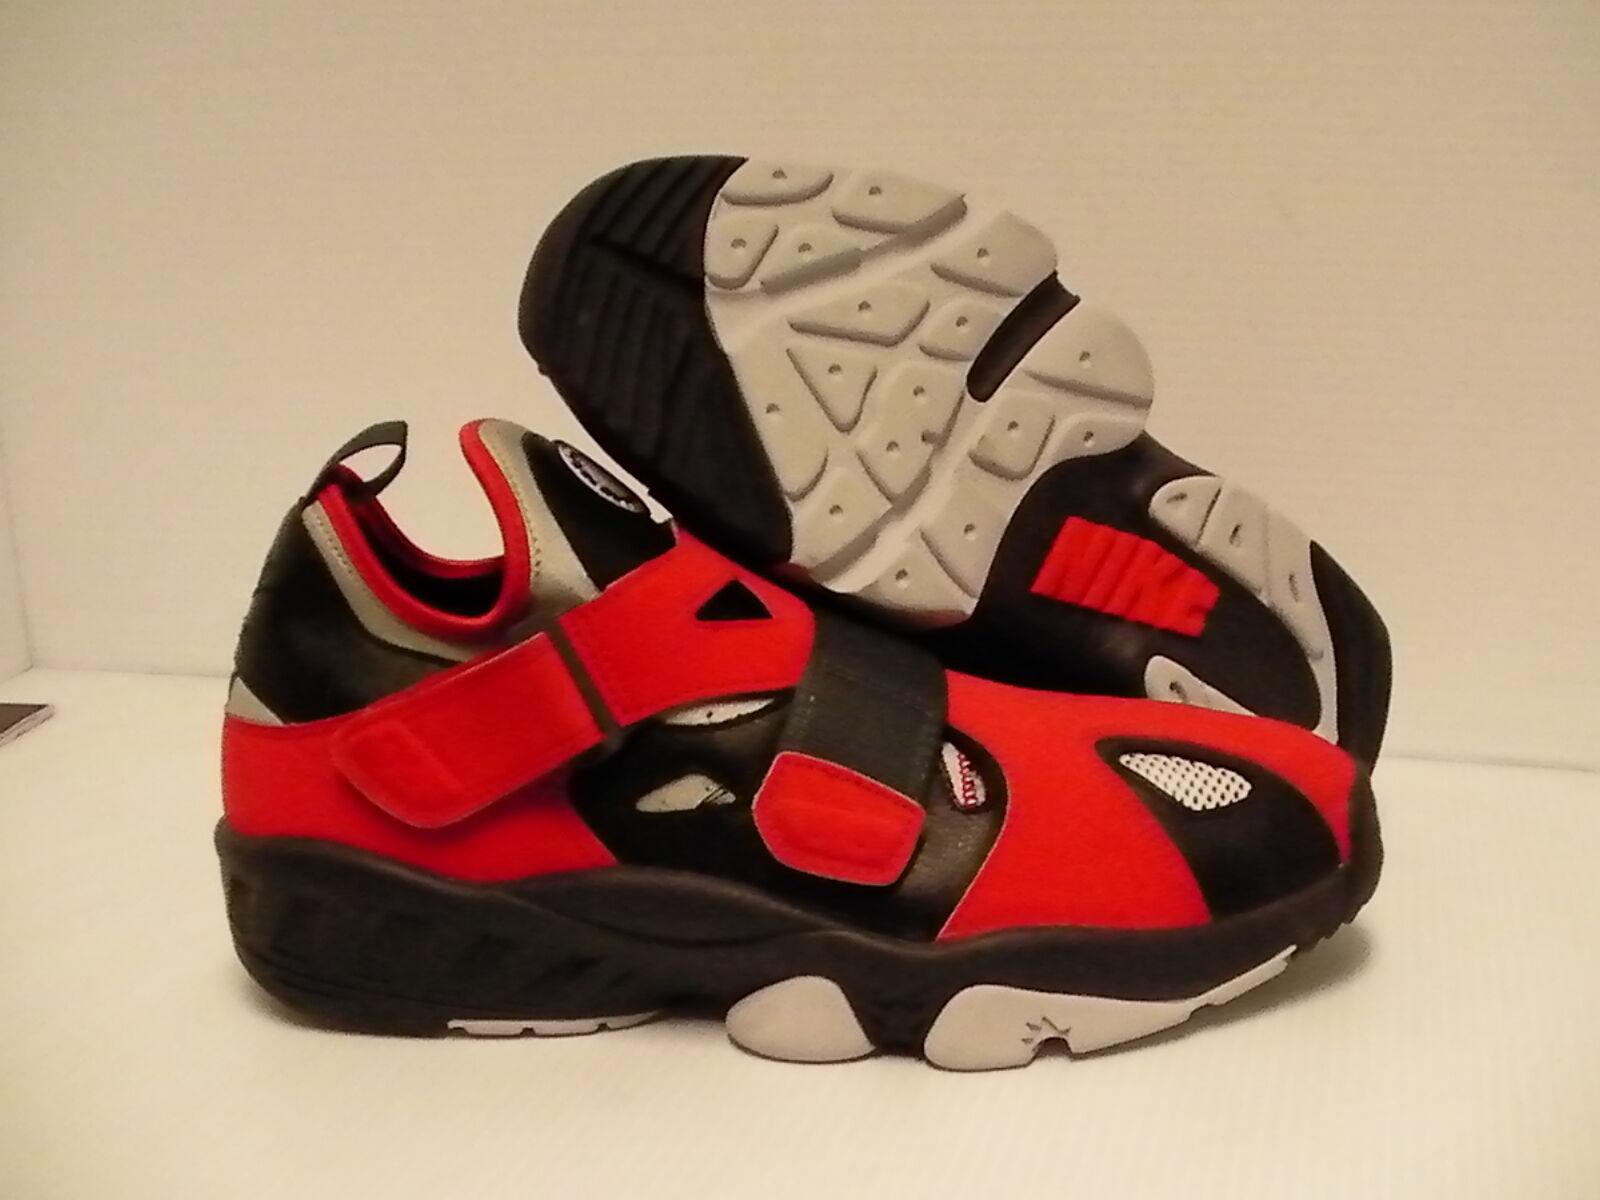 Nike Air Trainer Huarache 94 94 94 Chaussures EntraîneHommes t Pointure 10.5 Us Neuf 35fa15